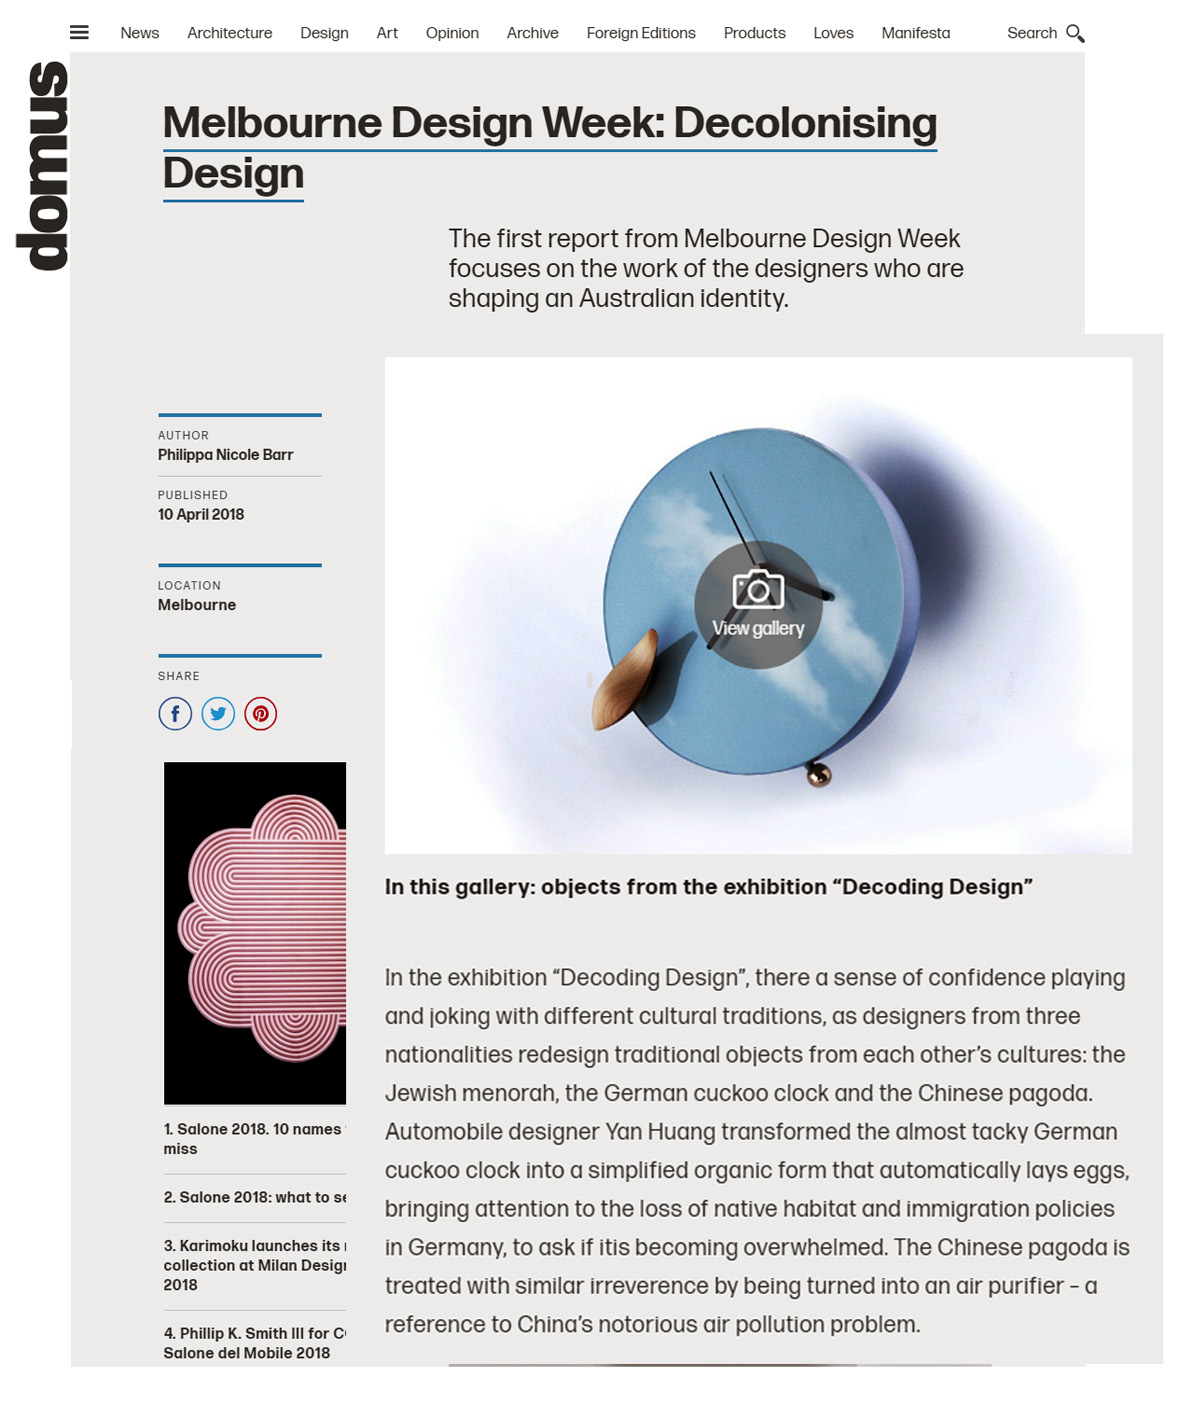 Decoding design was featured at Domus design 10 April, 2018